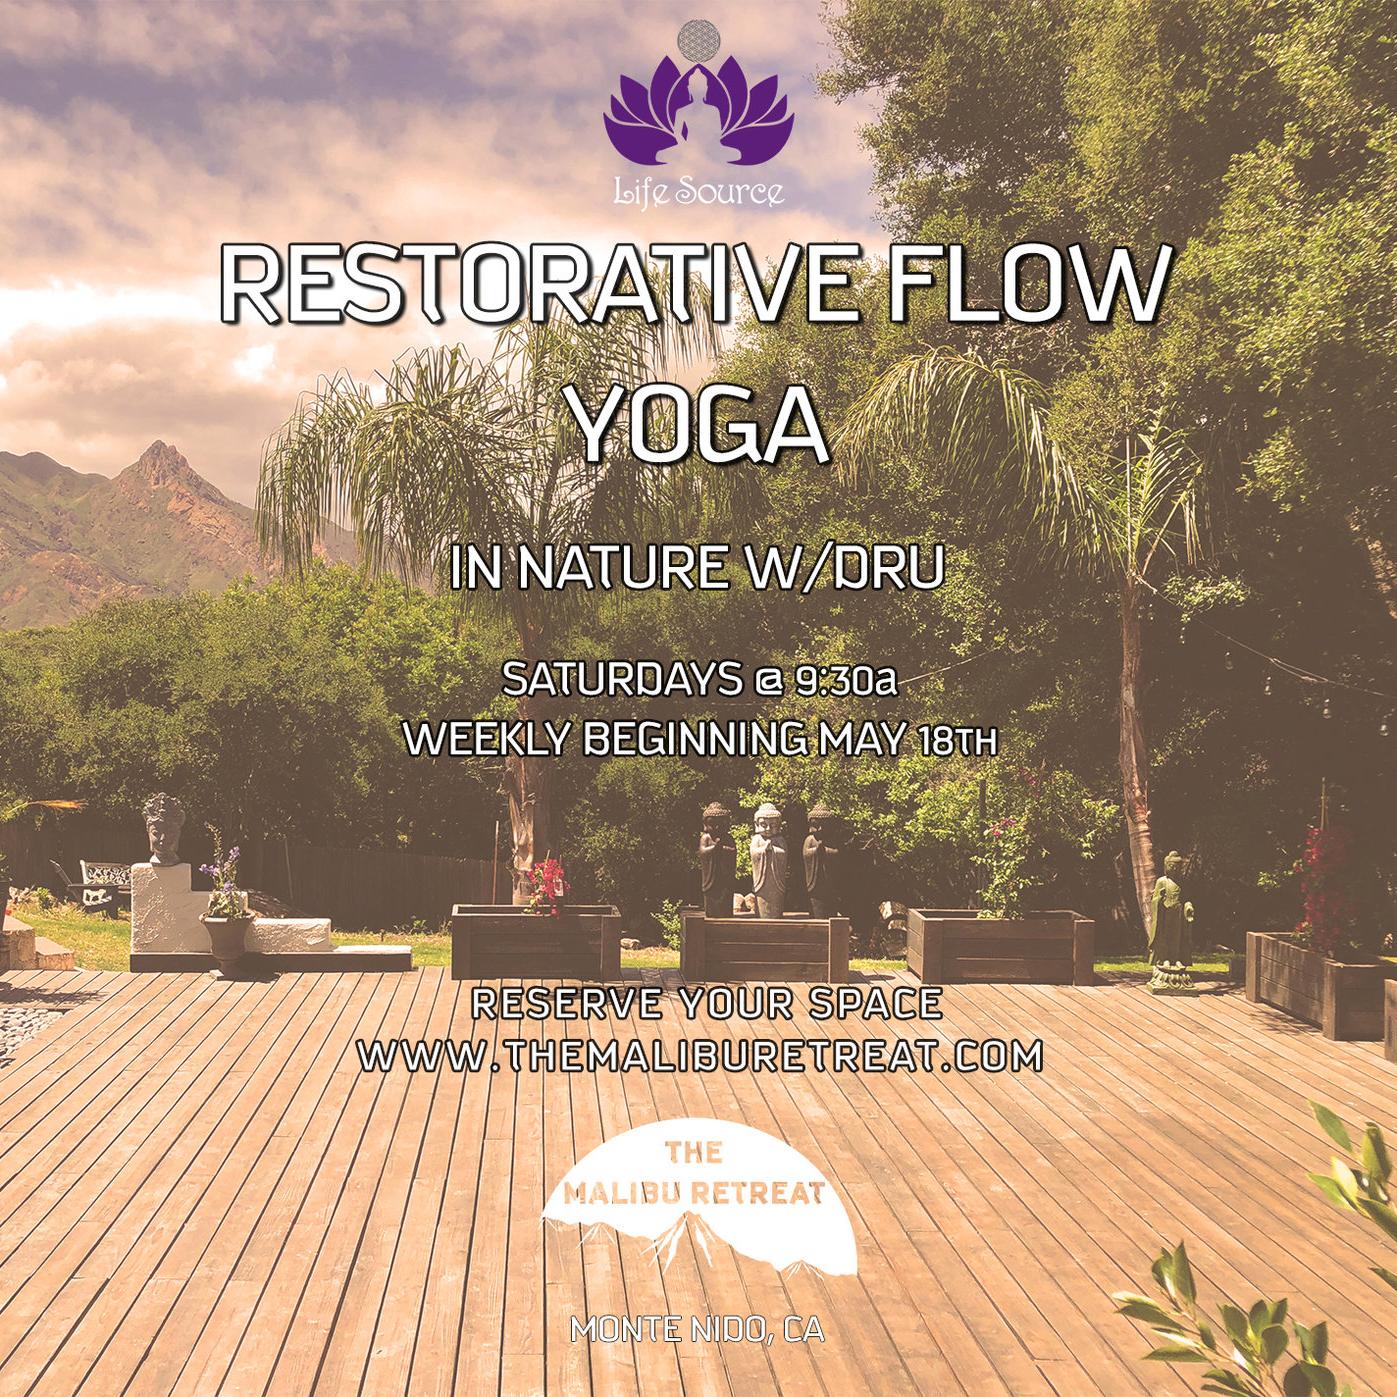 restorative+flow+yoga.jpg